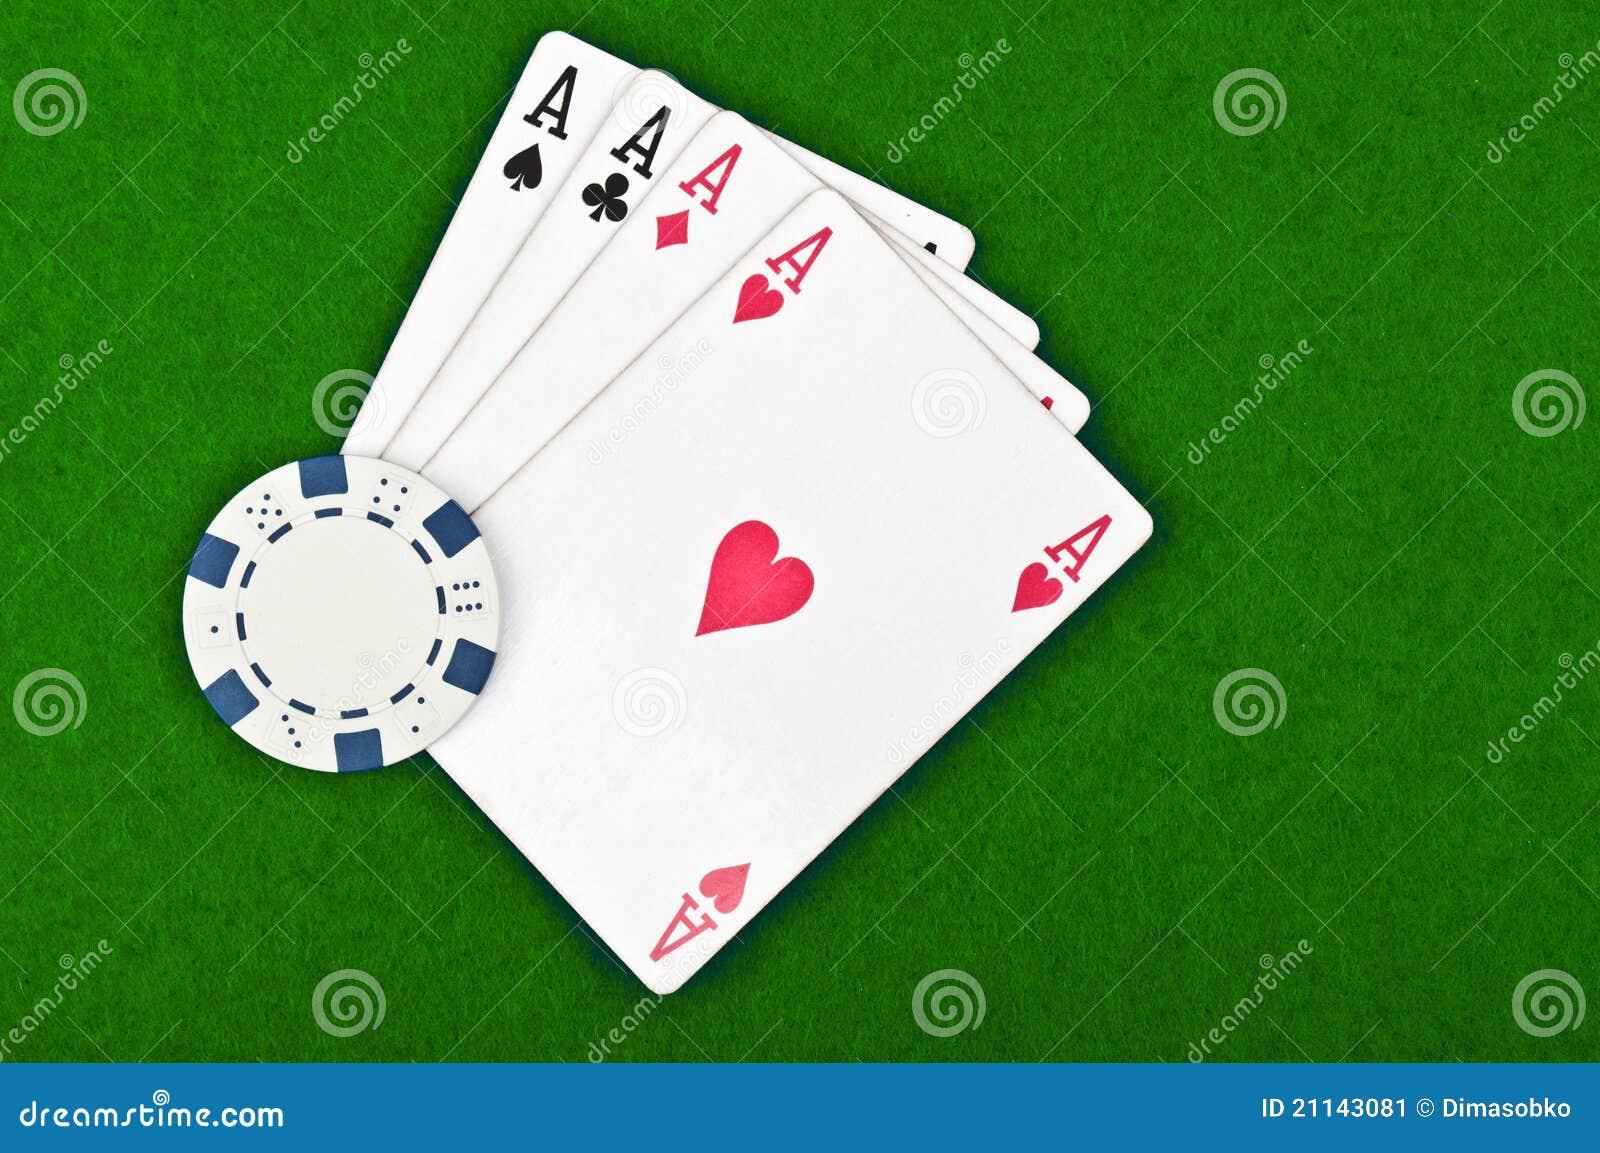 four aces poker room kahnawake